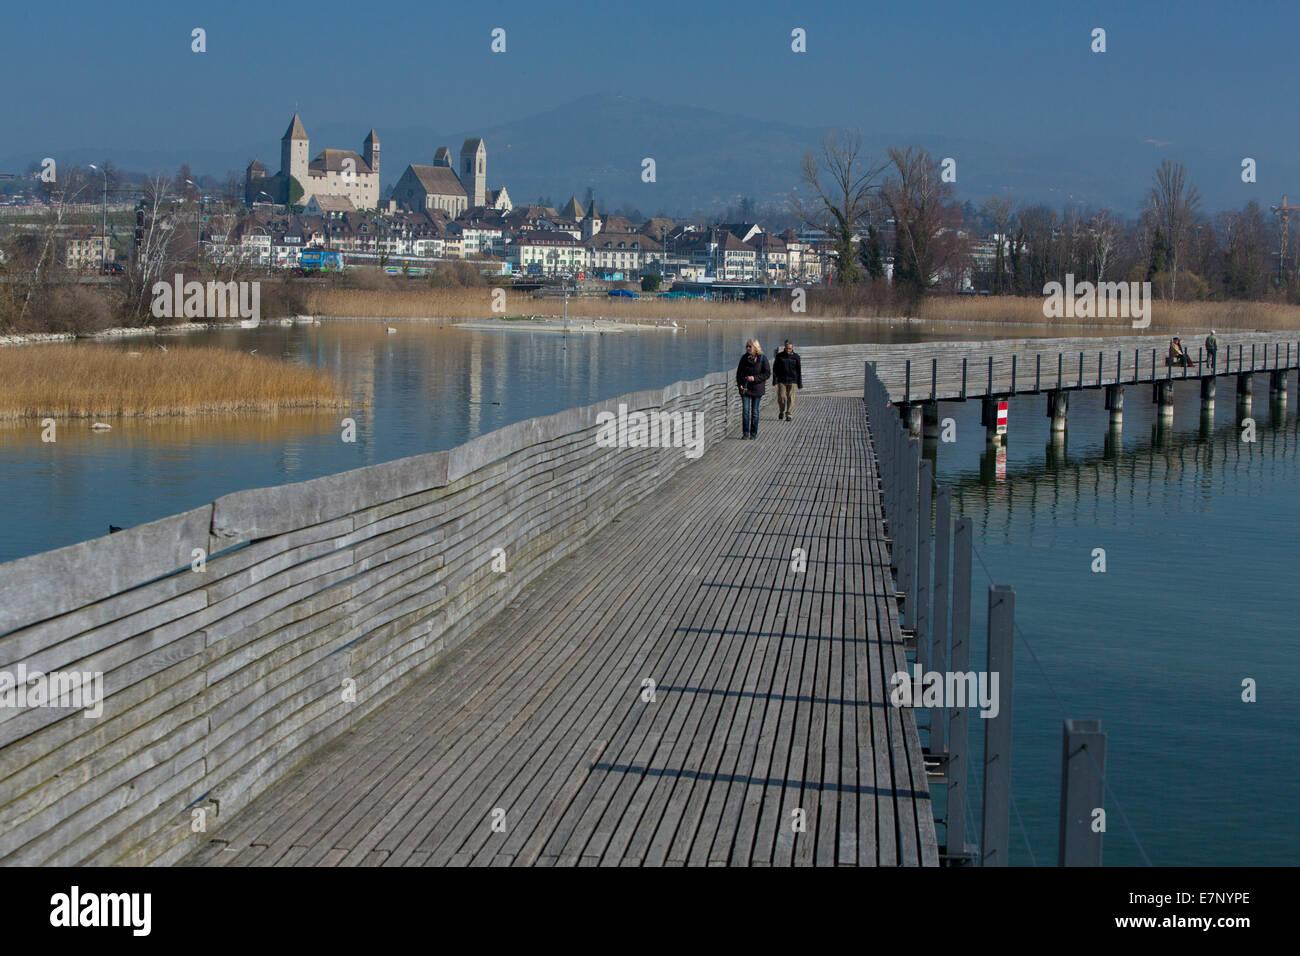 Zürichsee, Jakobs Weg, Holzsteg, Rapperswil SG, Frühling, See, Seen, Stadt, Stadt, SG, Kanton St. Gallen, Stockbild